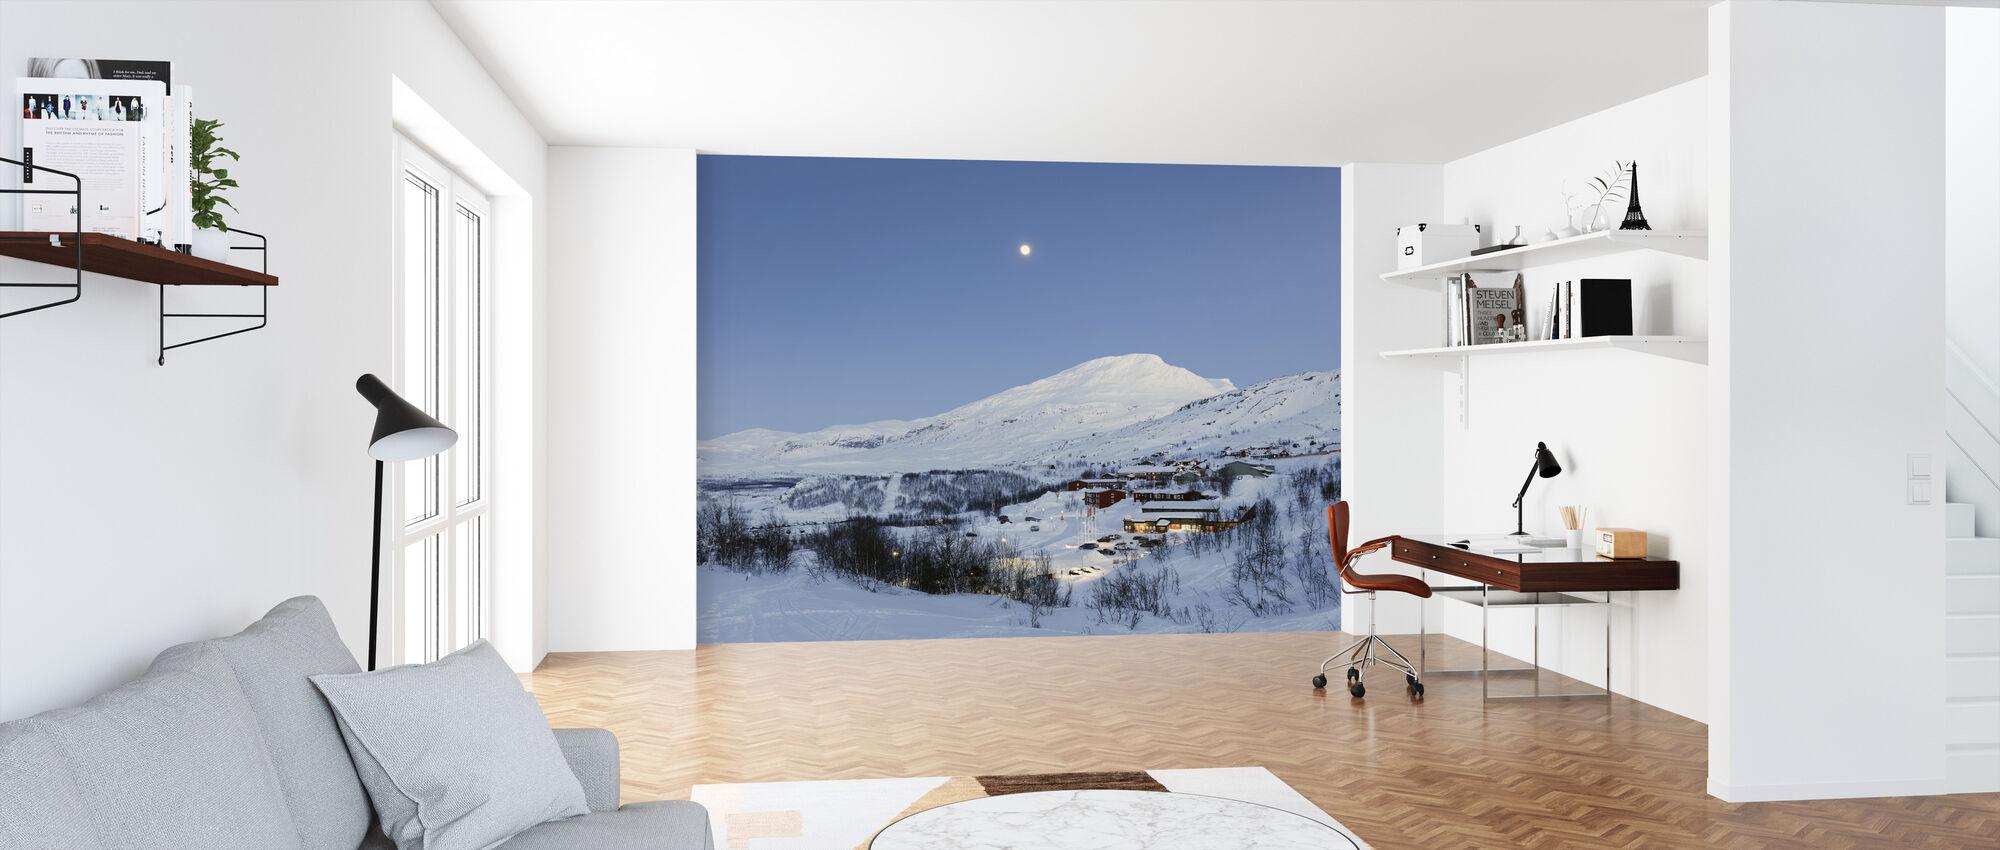 Lapland Mountain - Wallpaper - Office